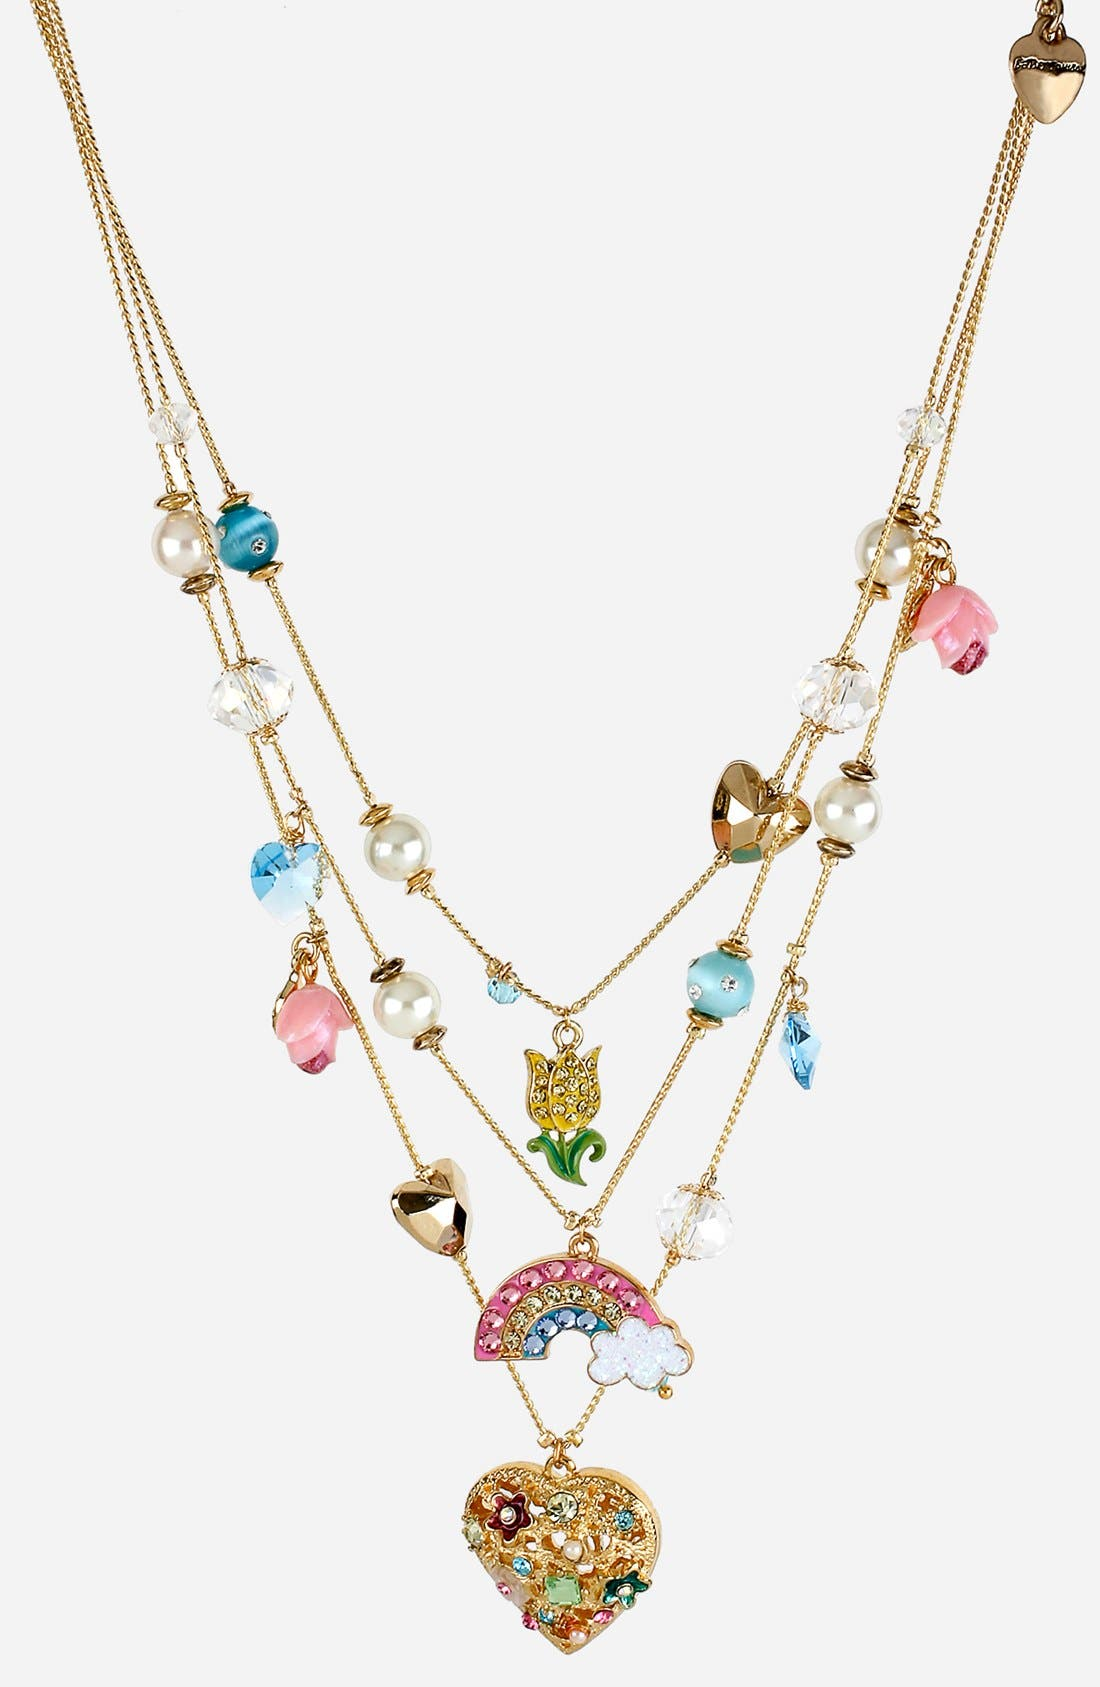 Main Image - Betsey Johnson 'Fairyland' Multistrand Charm Necklace